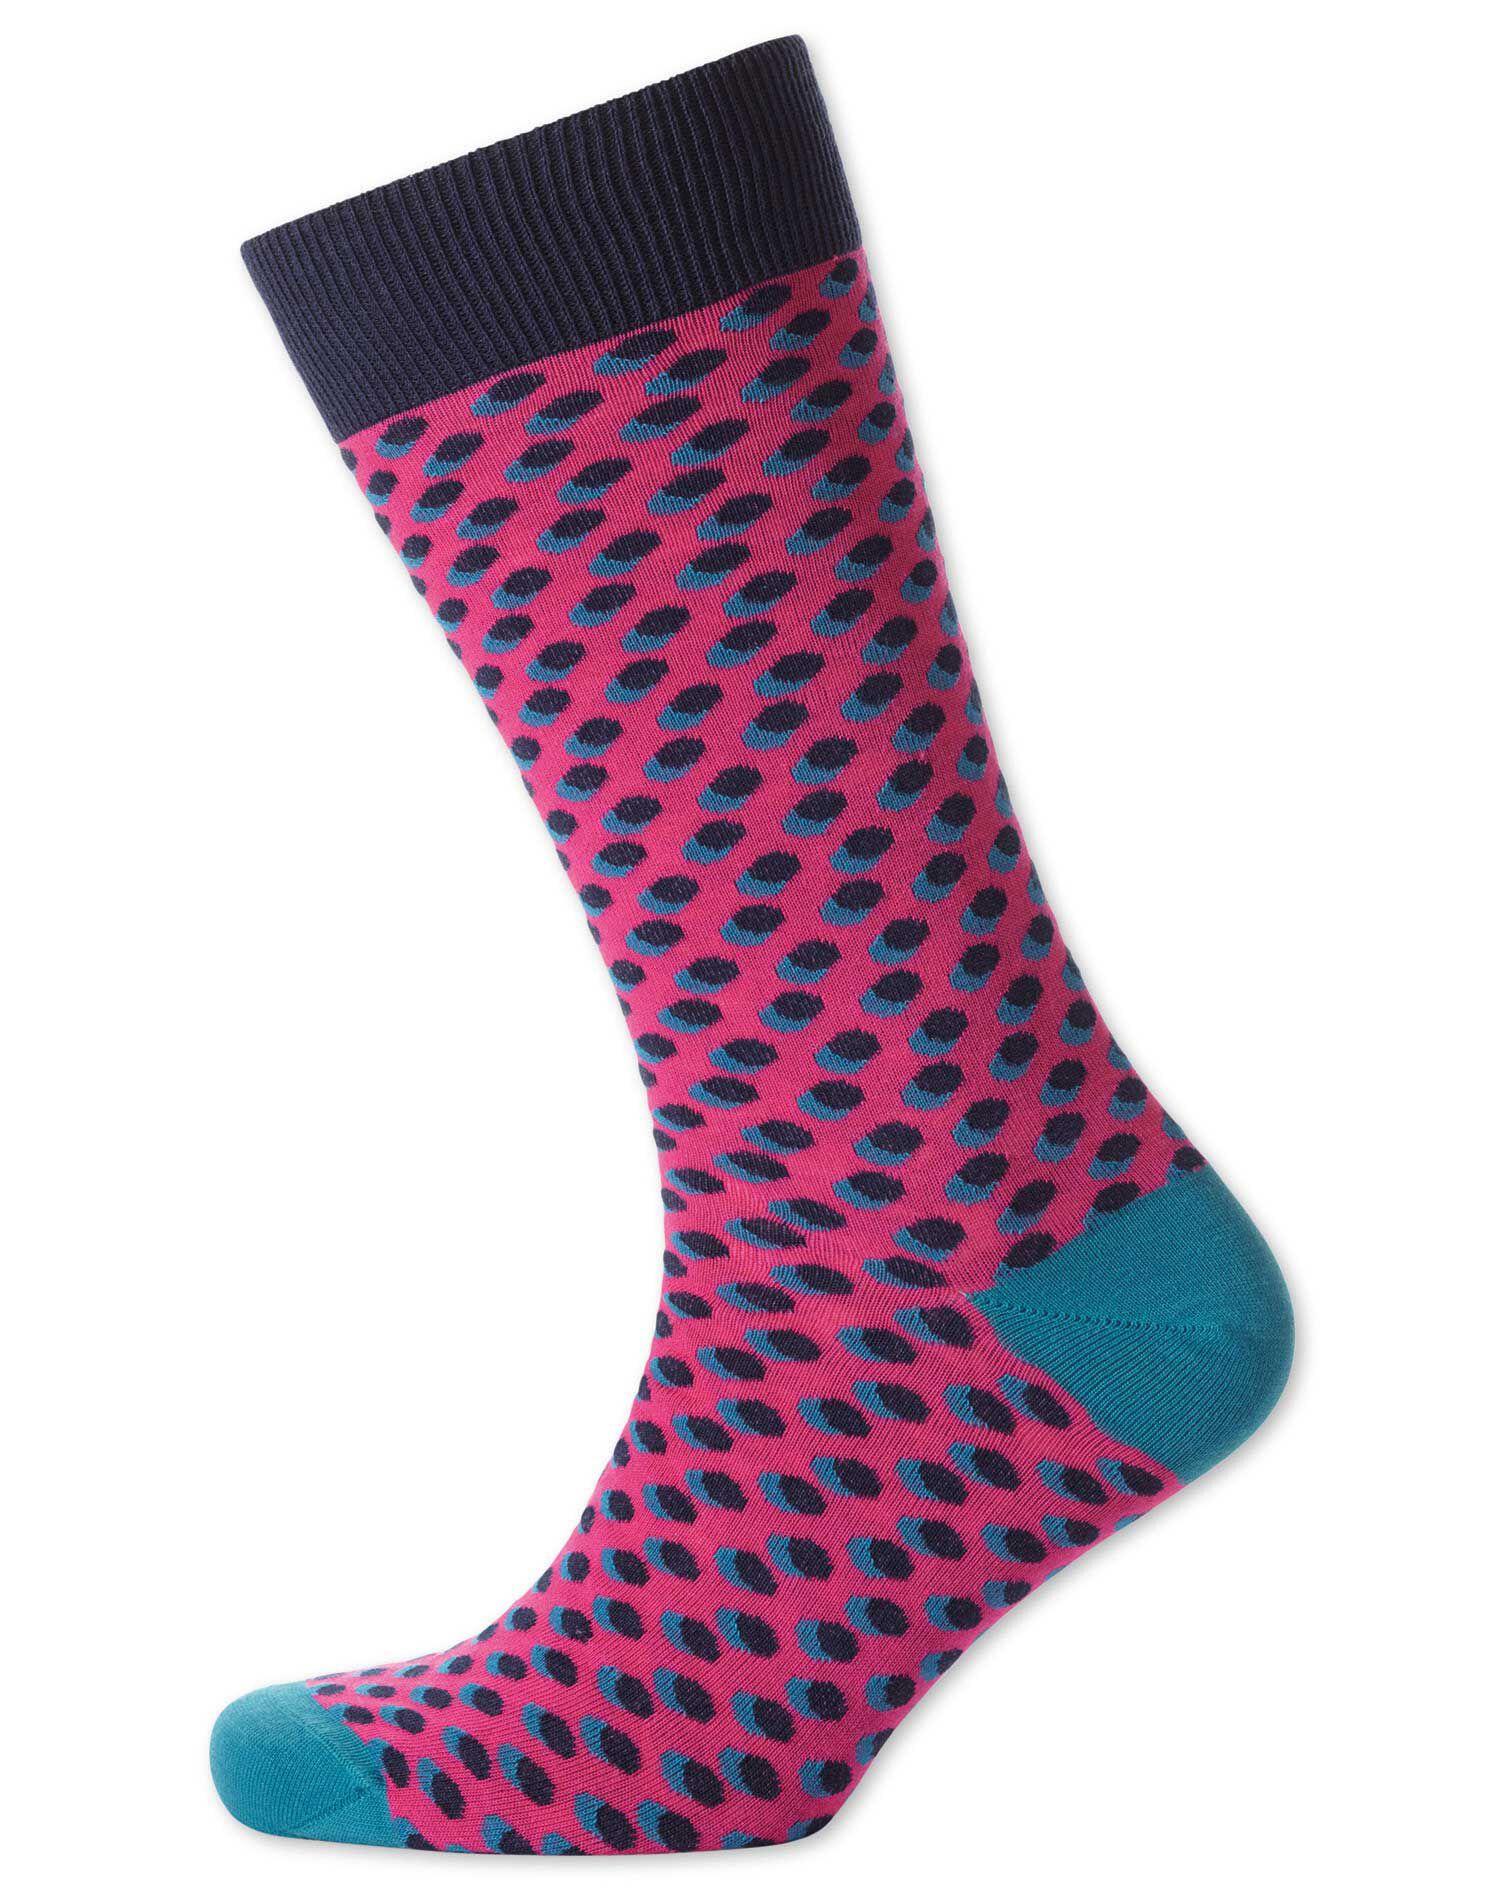 Pink Shadow Spot Socks Size Medium by Charles Tyrwhitt